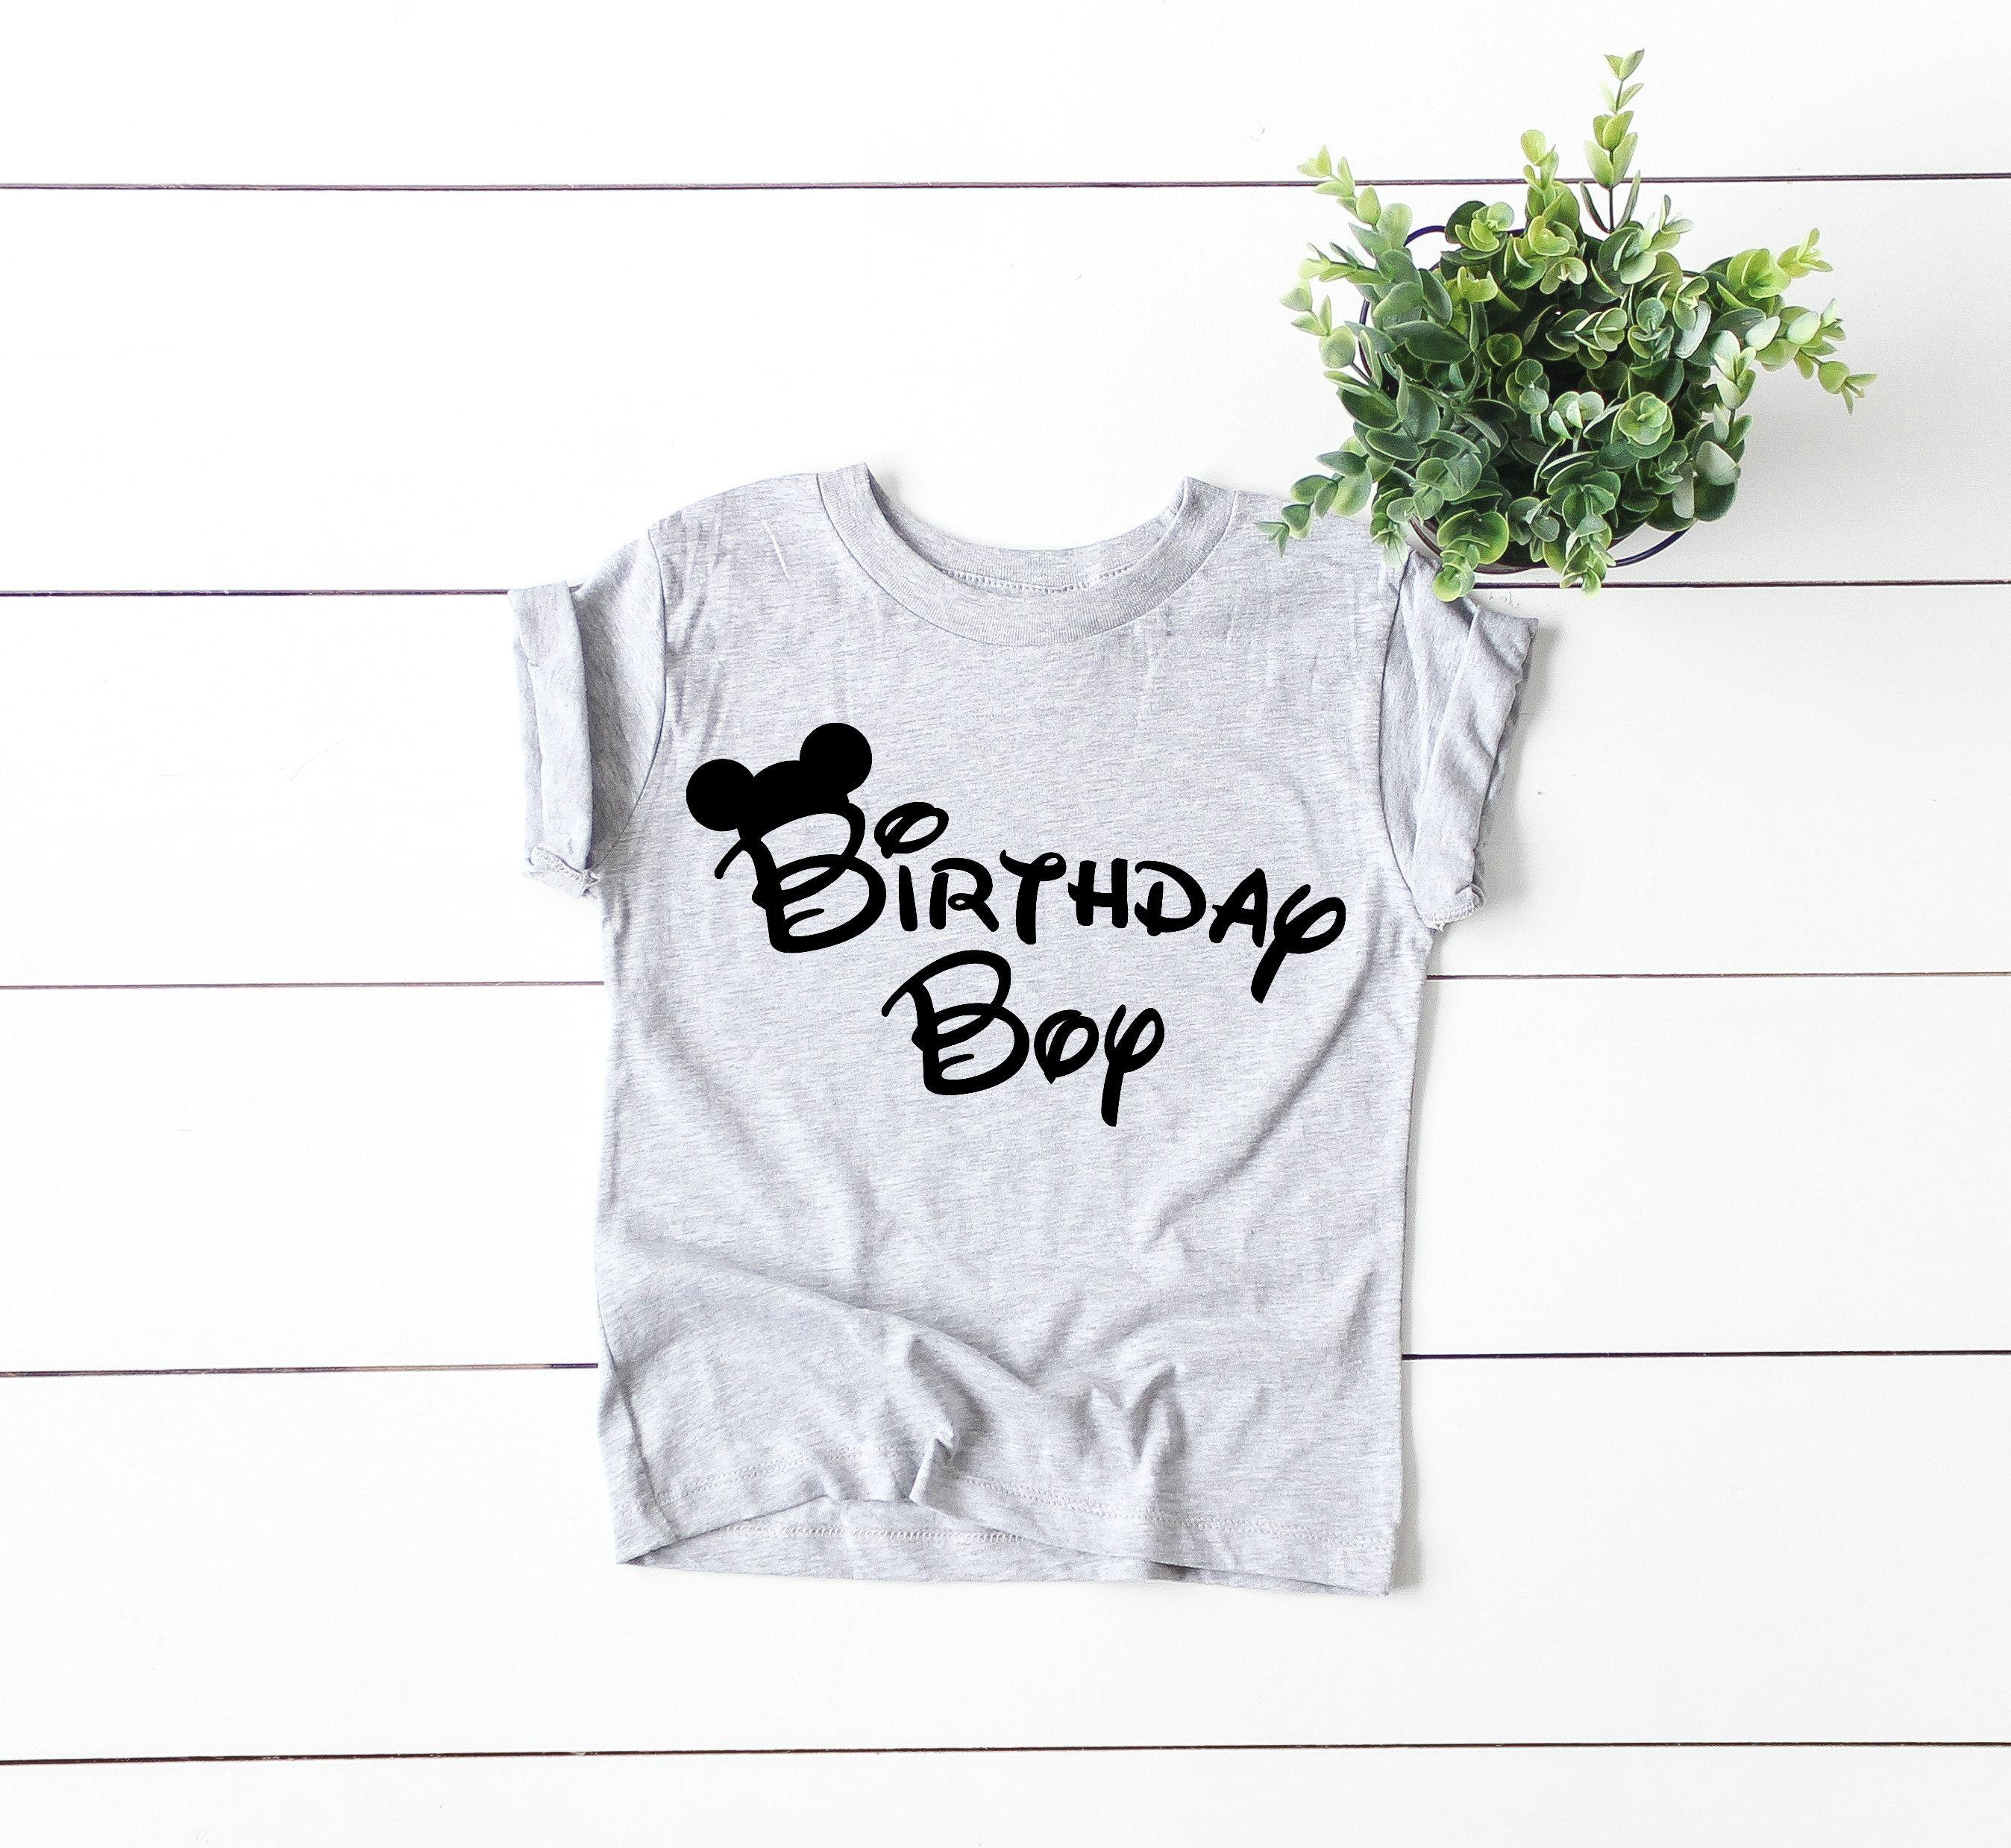 Birthday Boy Mickey Mouse Ears Graphic Tee Disney Shirt